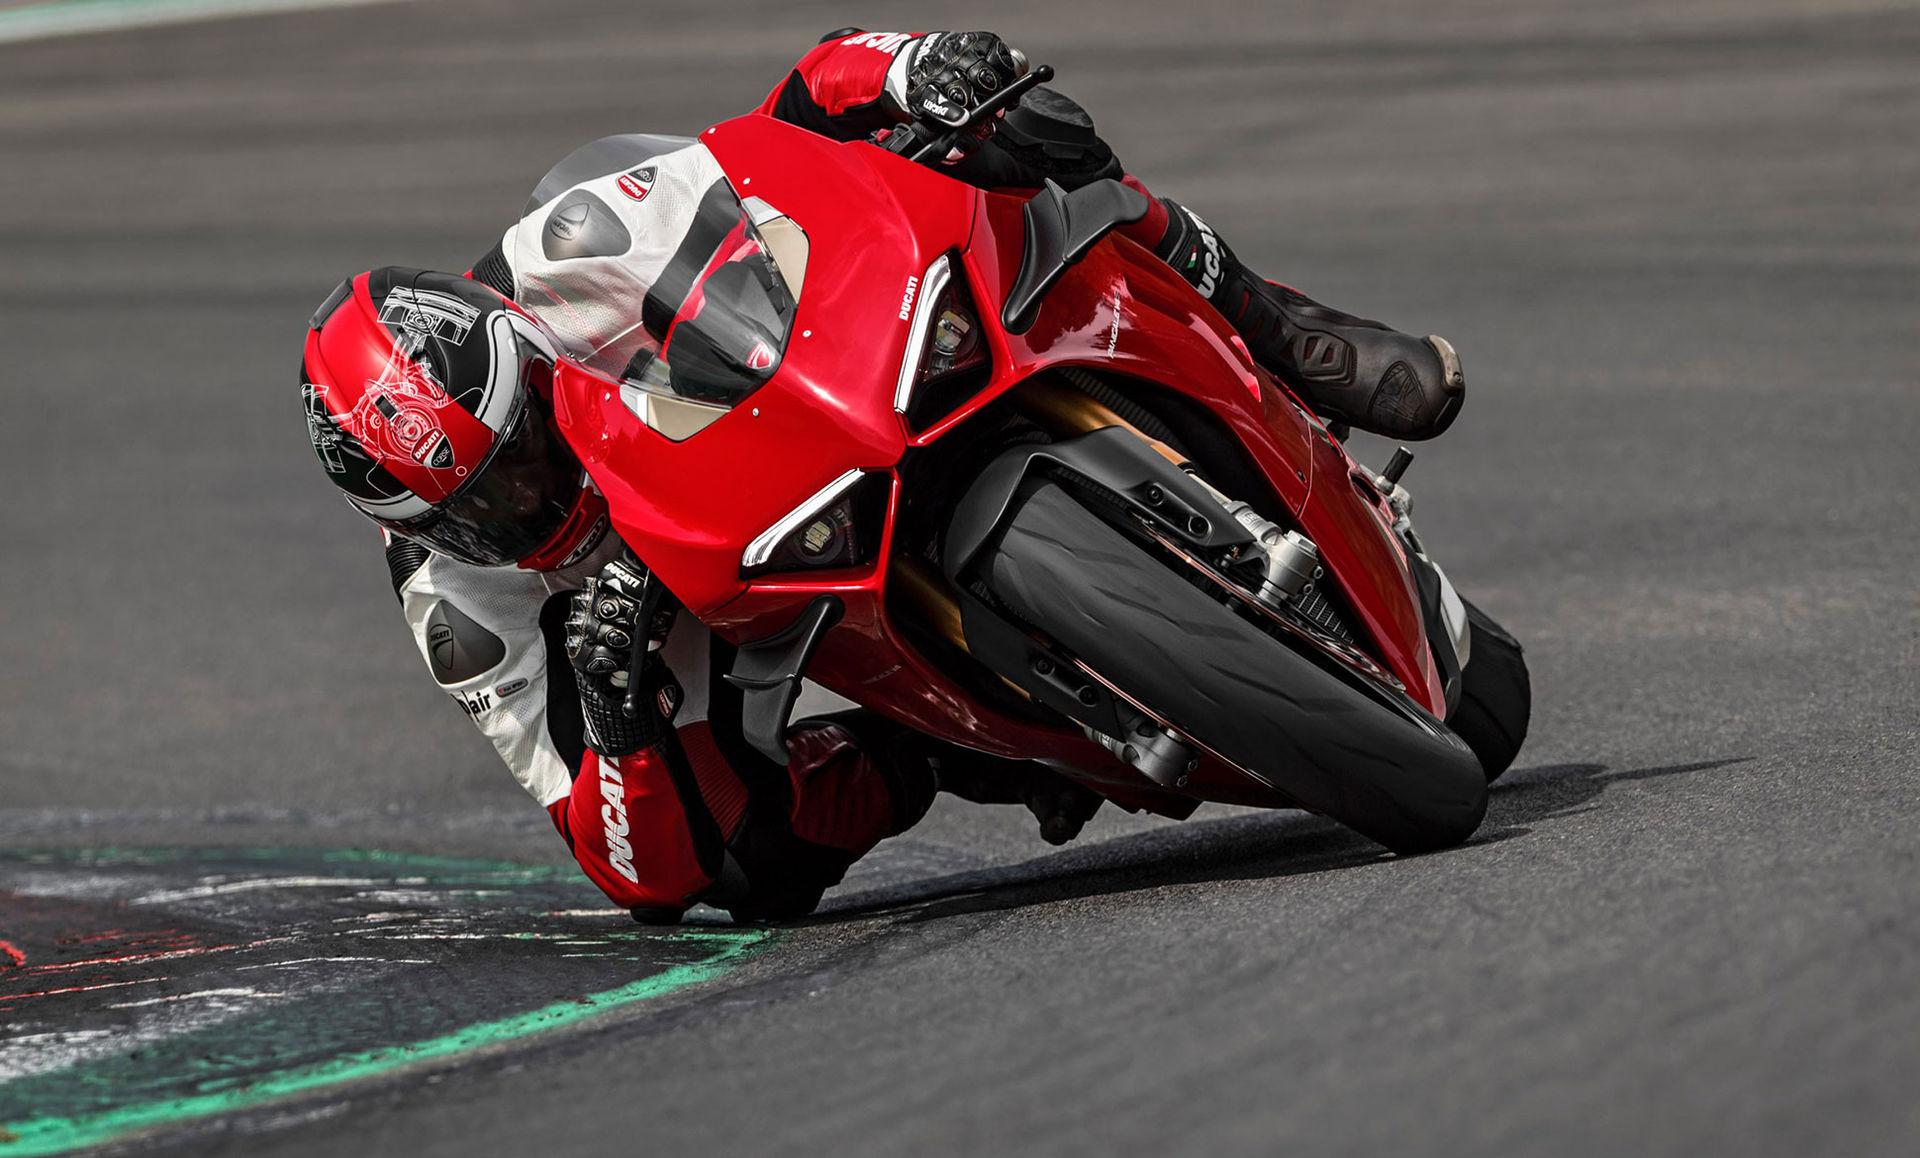 Ducati presenterar ny Streetfighter och ny Panigale